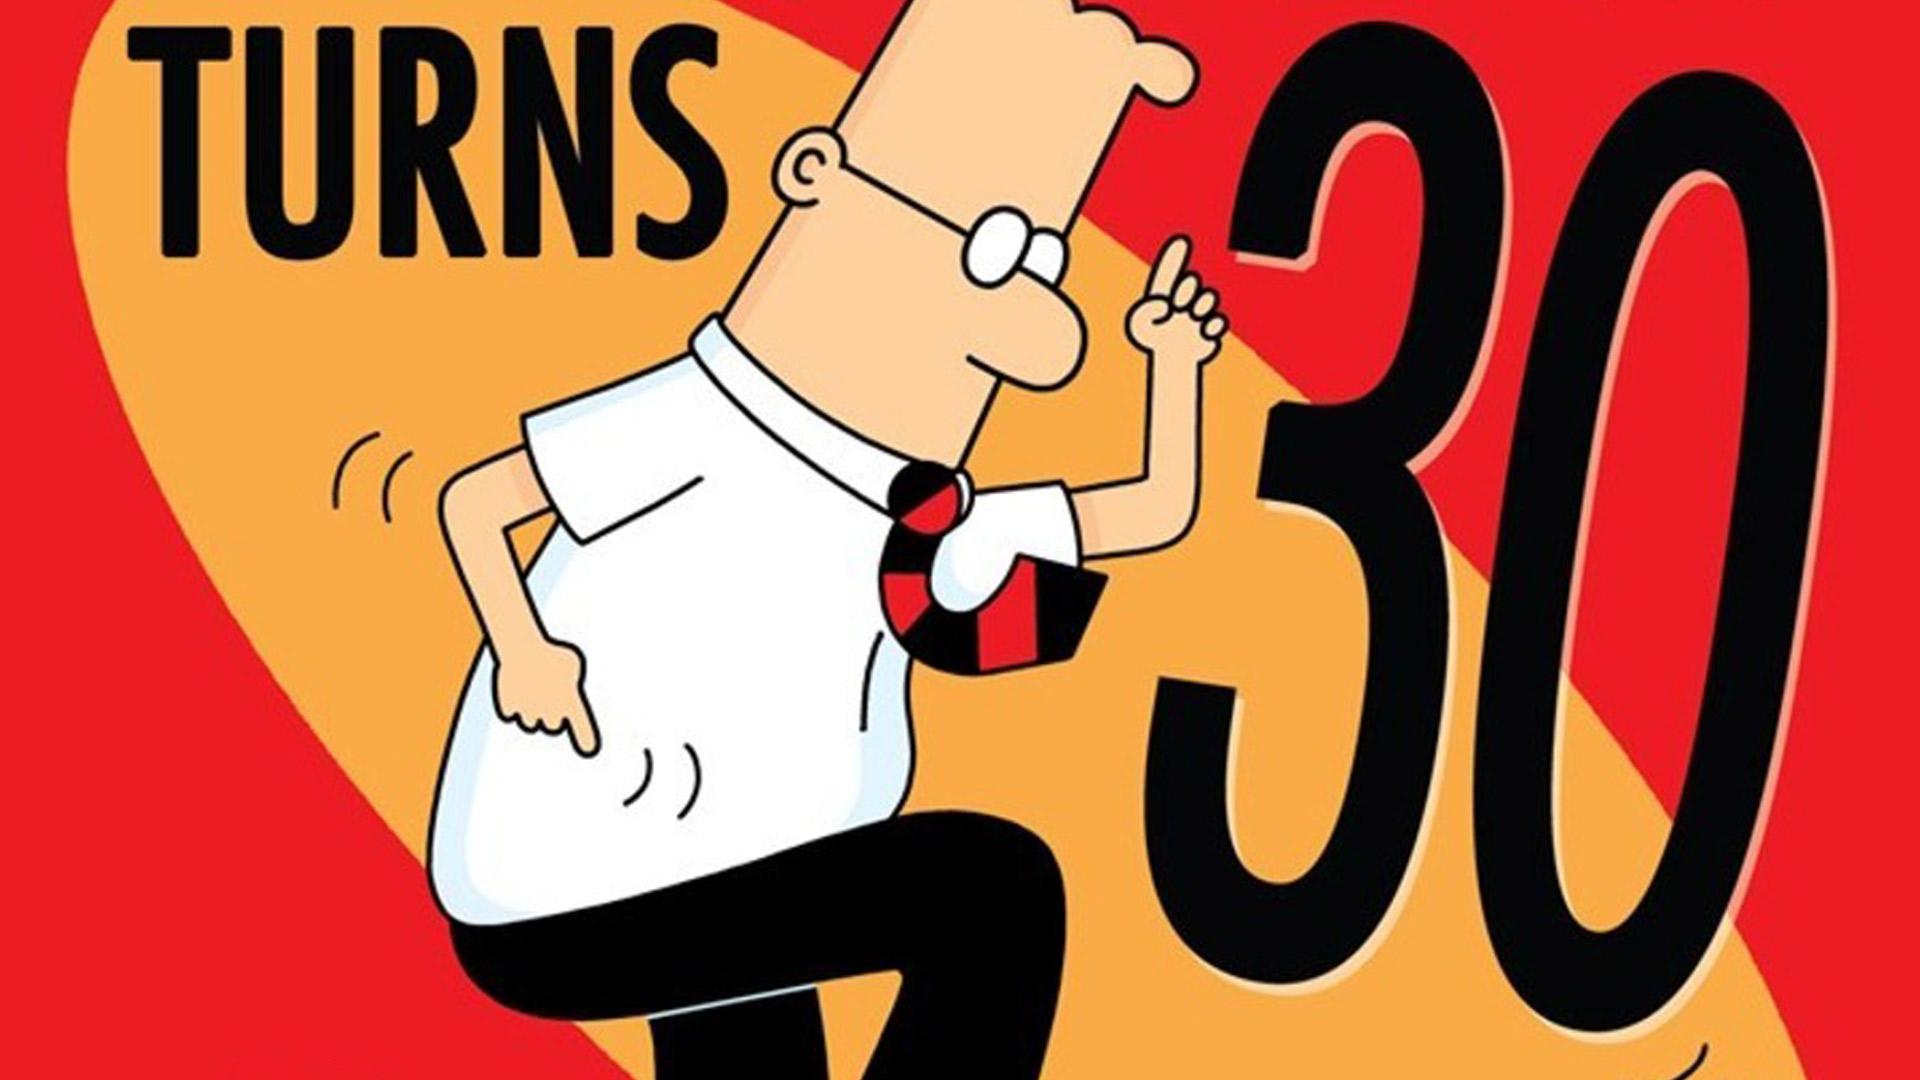 Dilbert Turns 30 (2019)